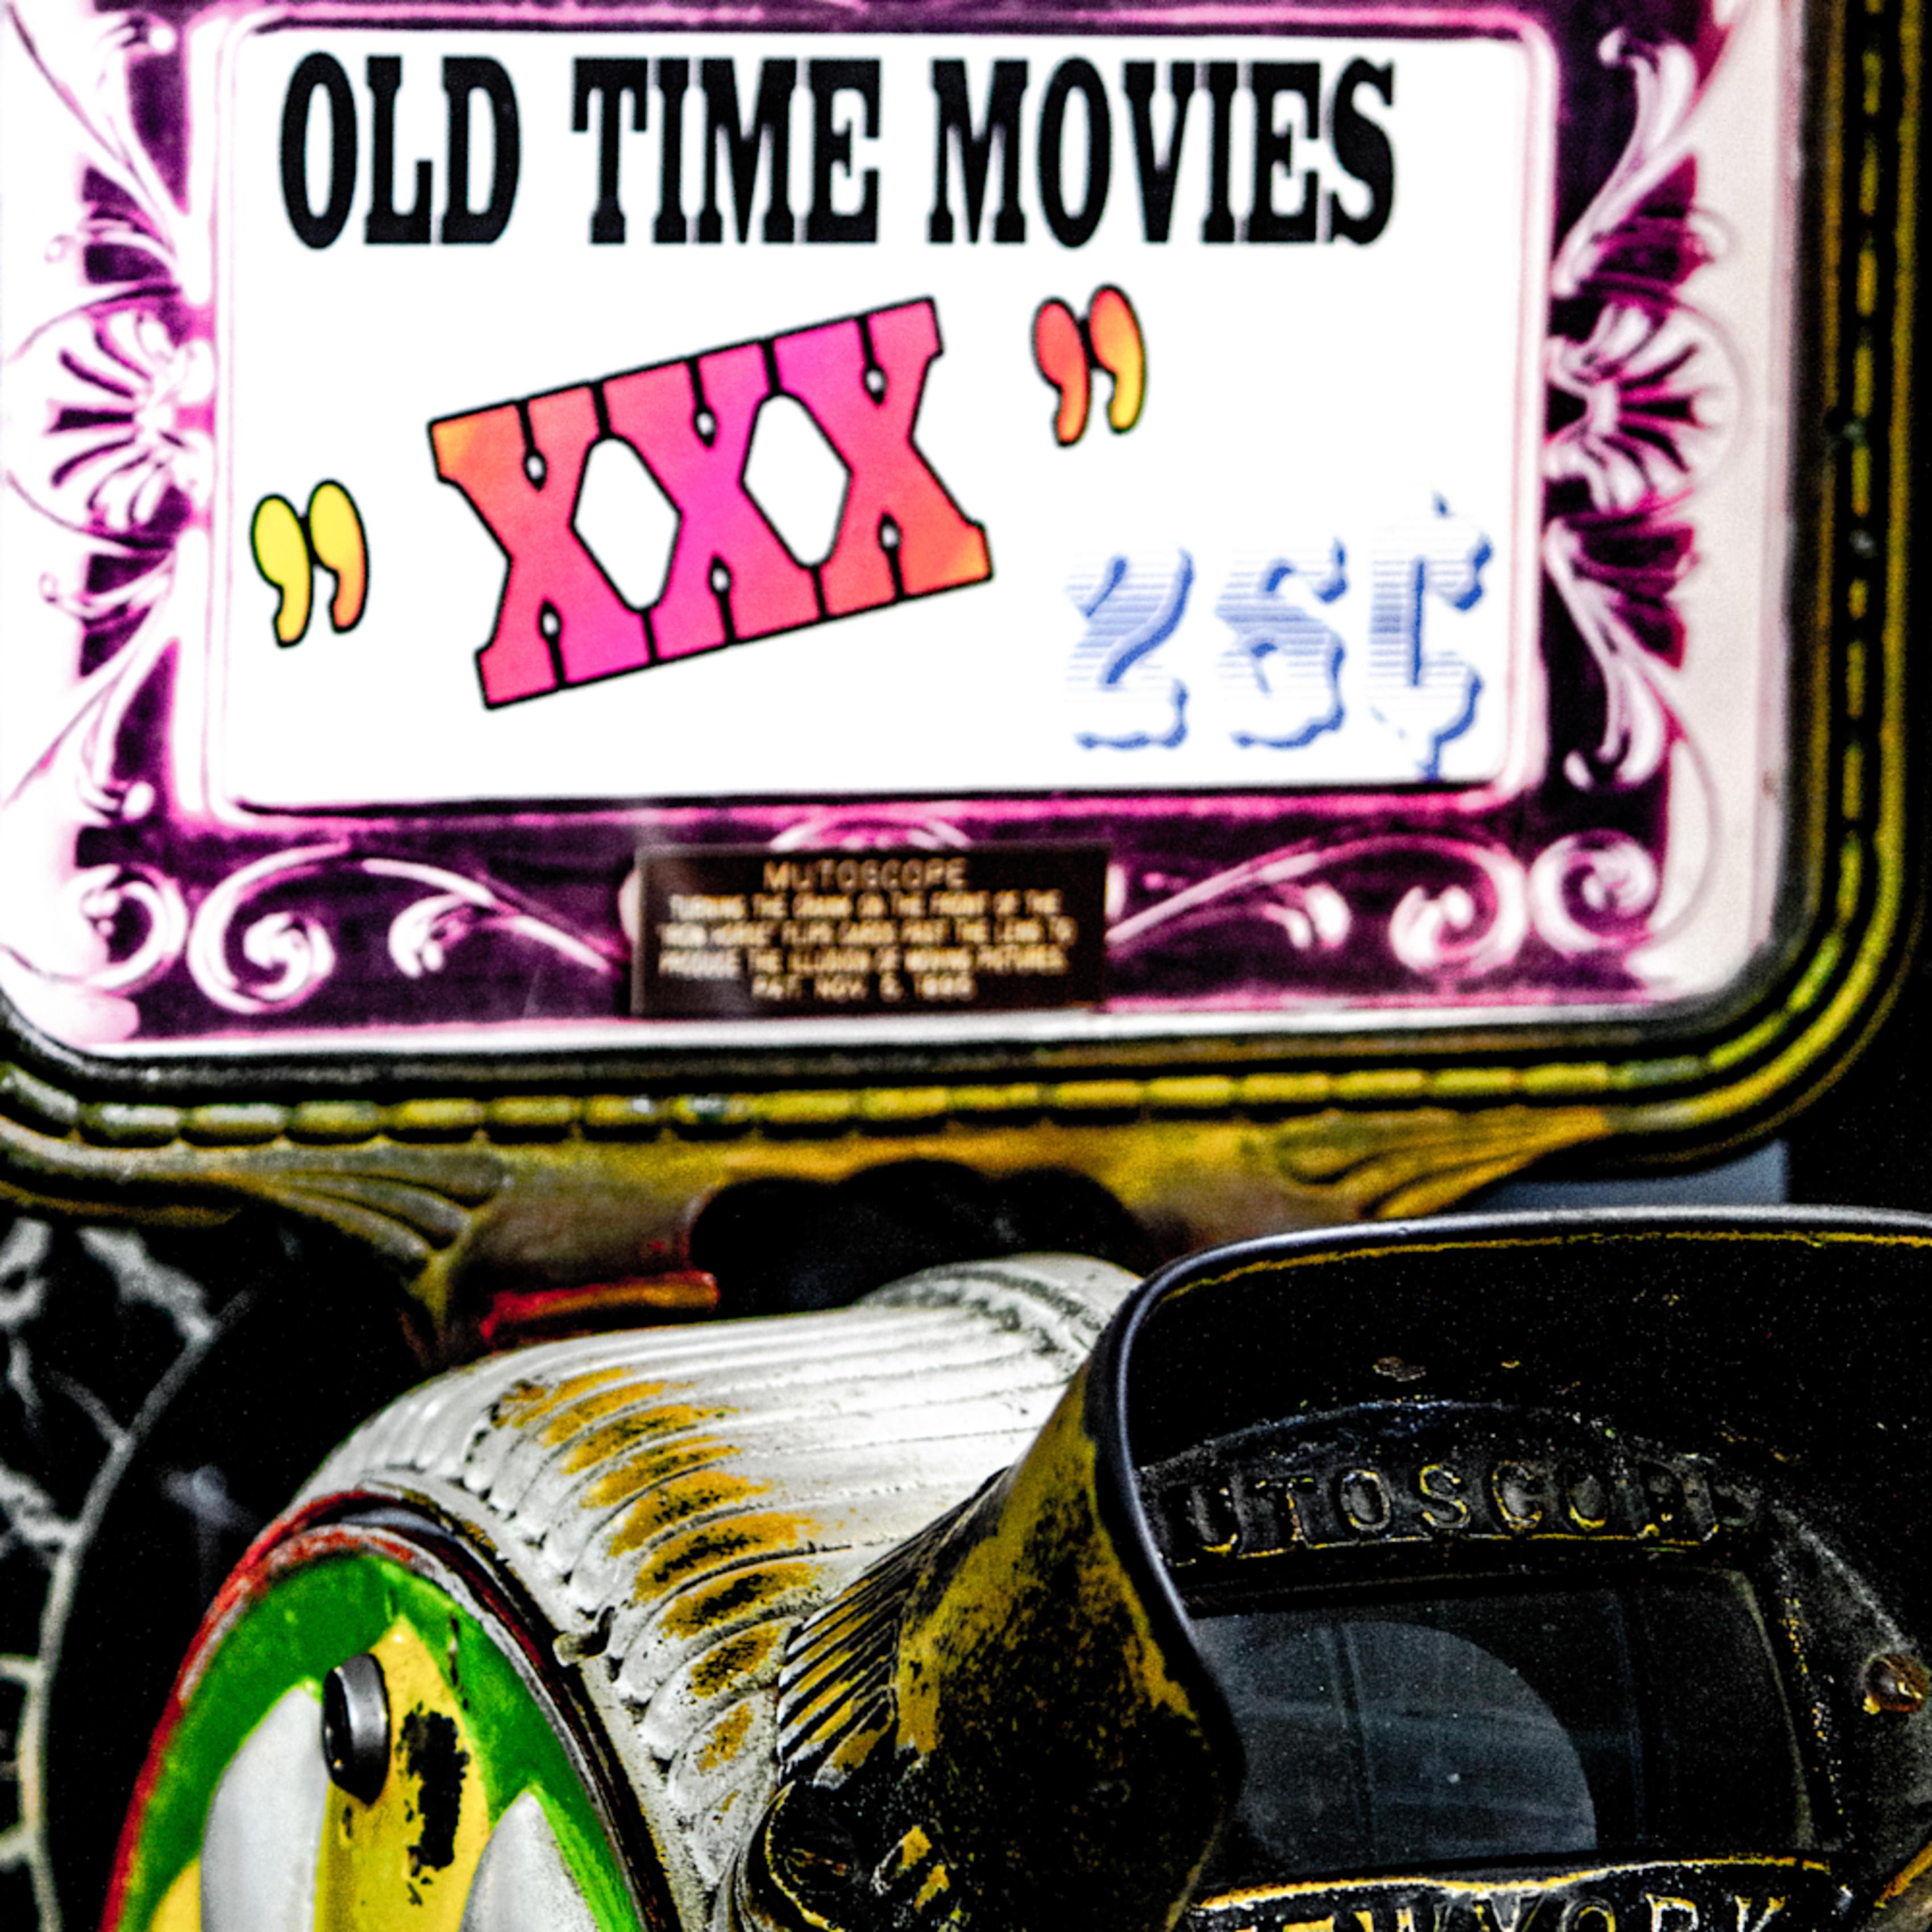 6144 old time movies mutoscope cdqstv